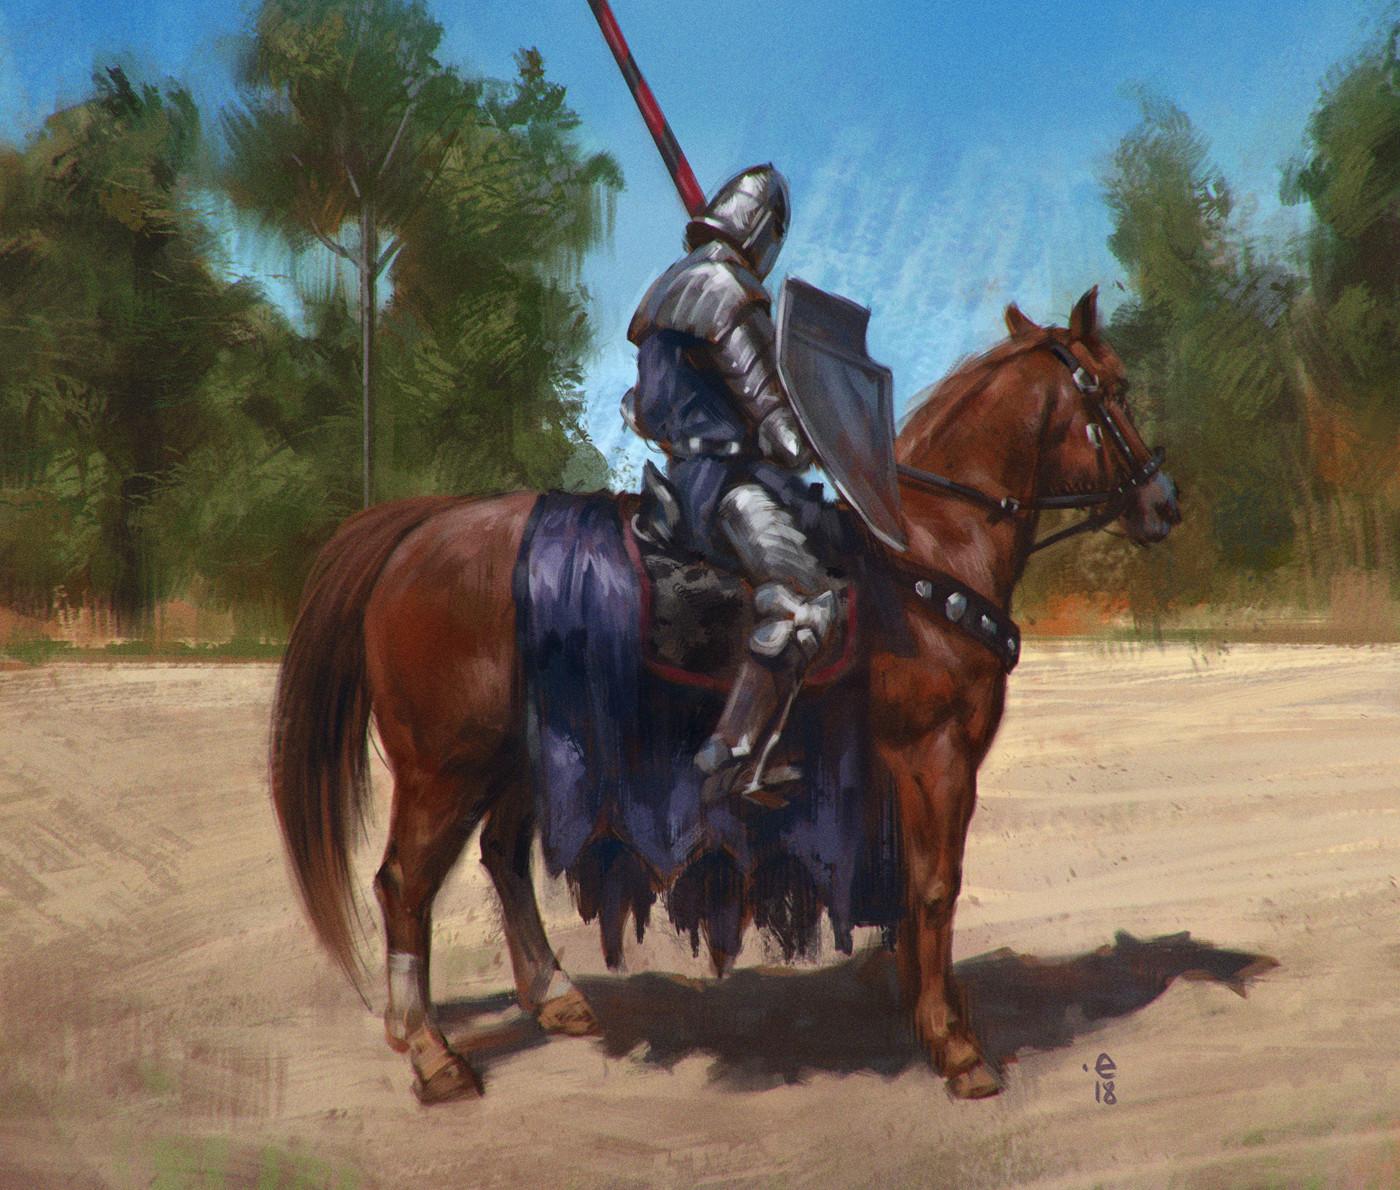 003. Knight study